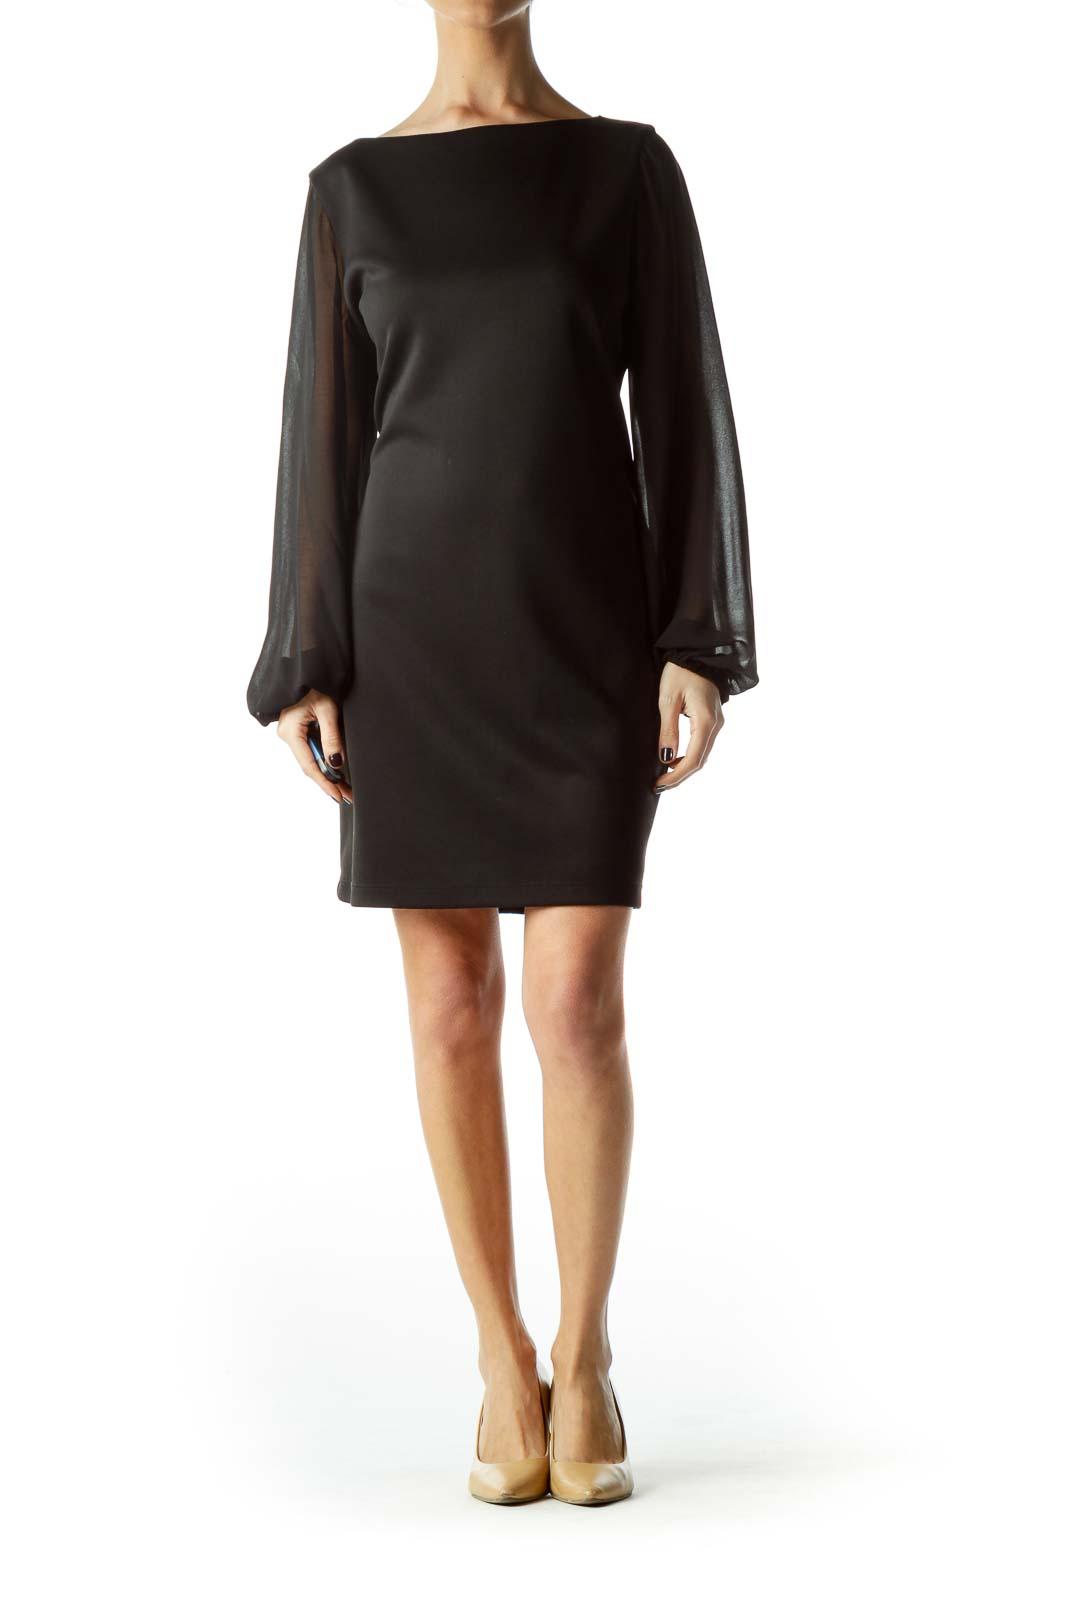 Black Dress with Long Sheer Sleeves